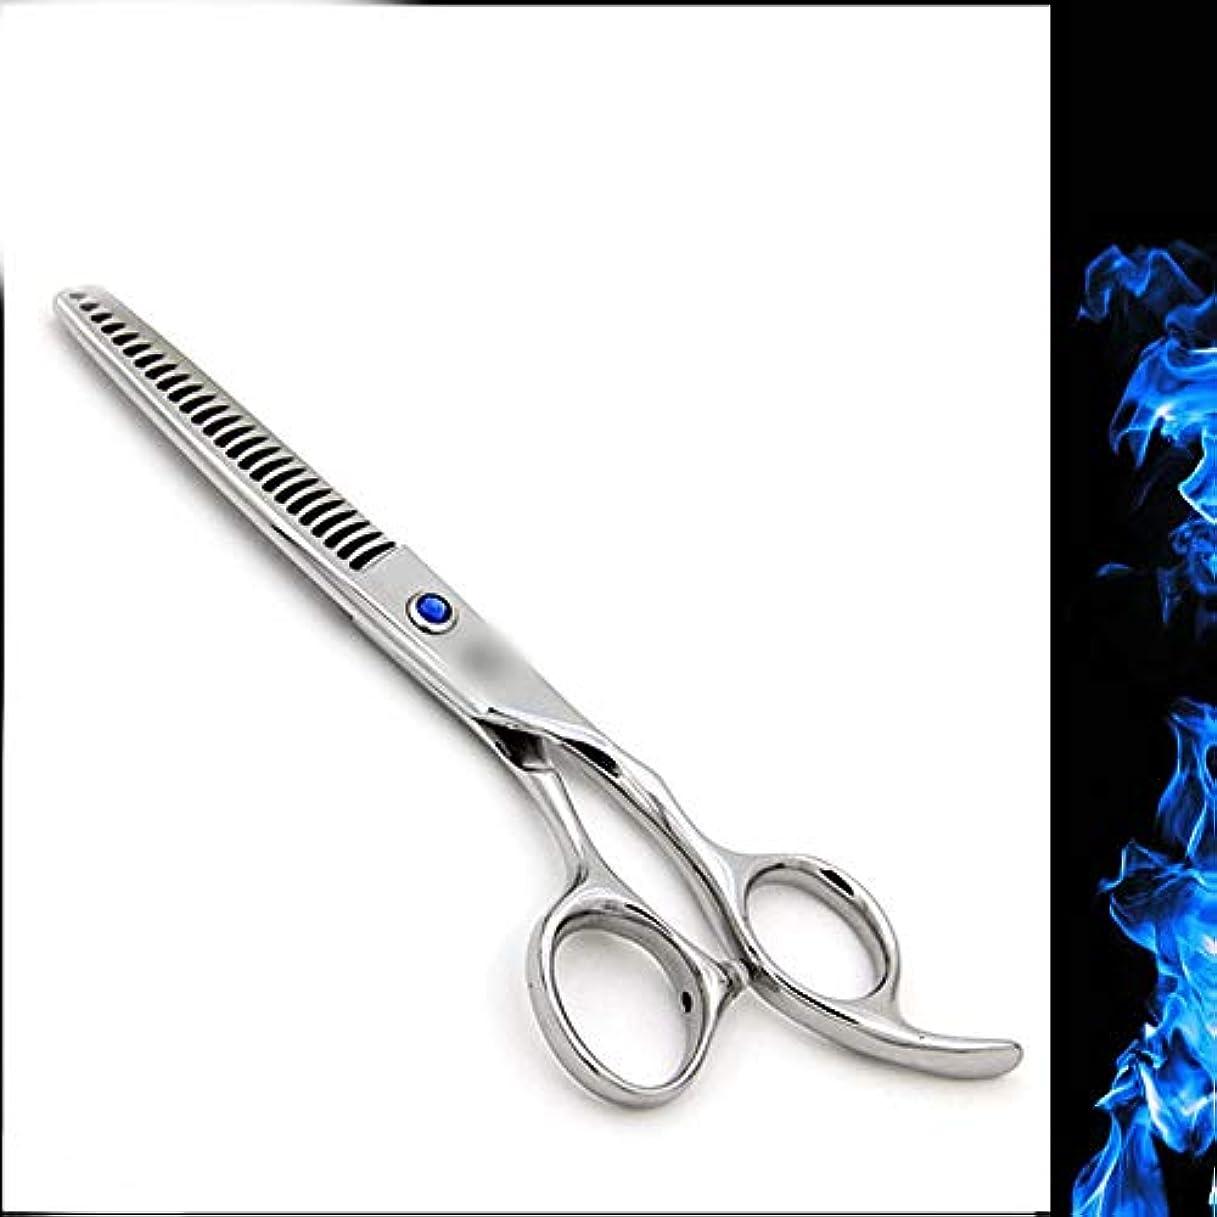 BOBIDYEE 6インチ美容院プロフェッショナルハイエンド理髪はさみ、美容院特別台形間伐歯はさみヘアカットはさみステンレス理髪はさみ (色 : Silver)